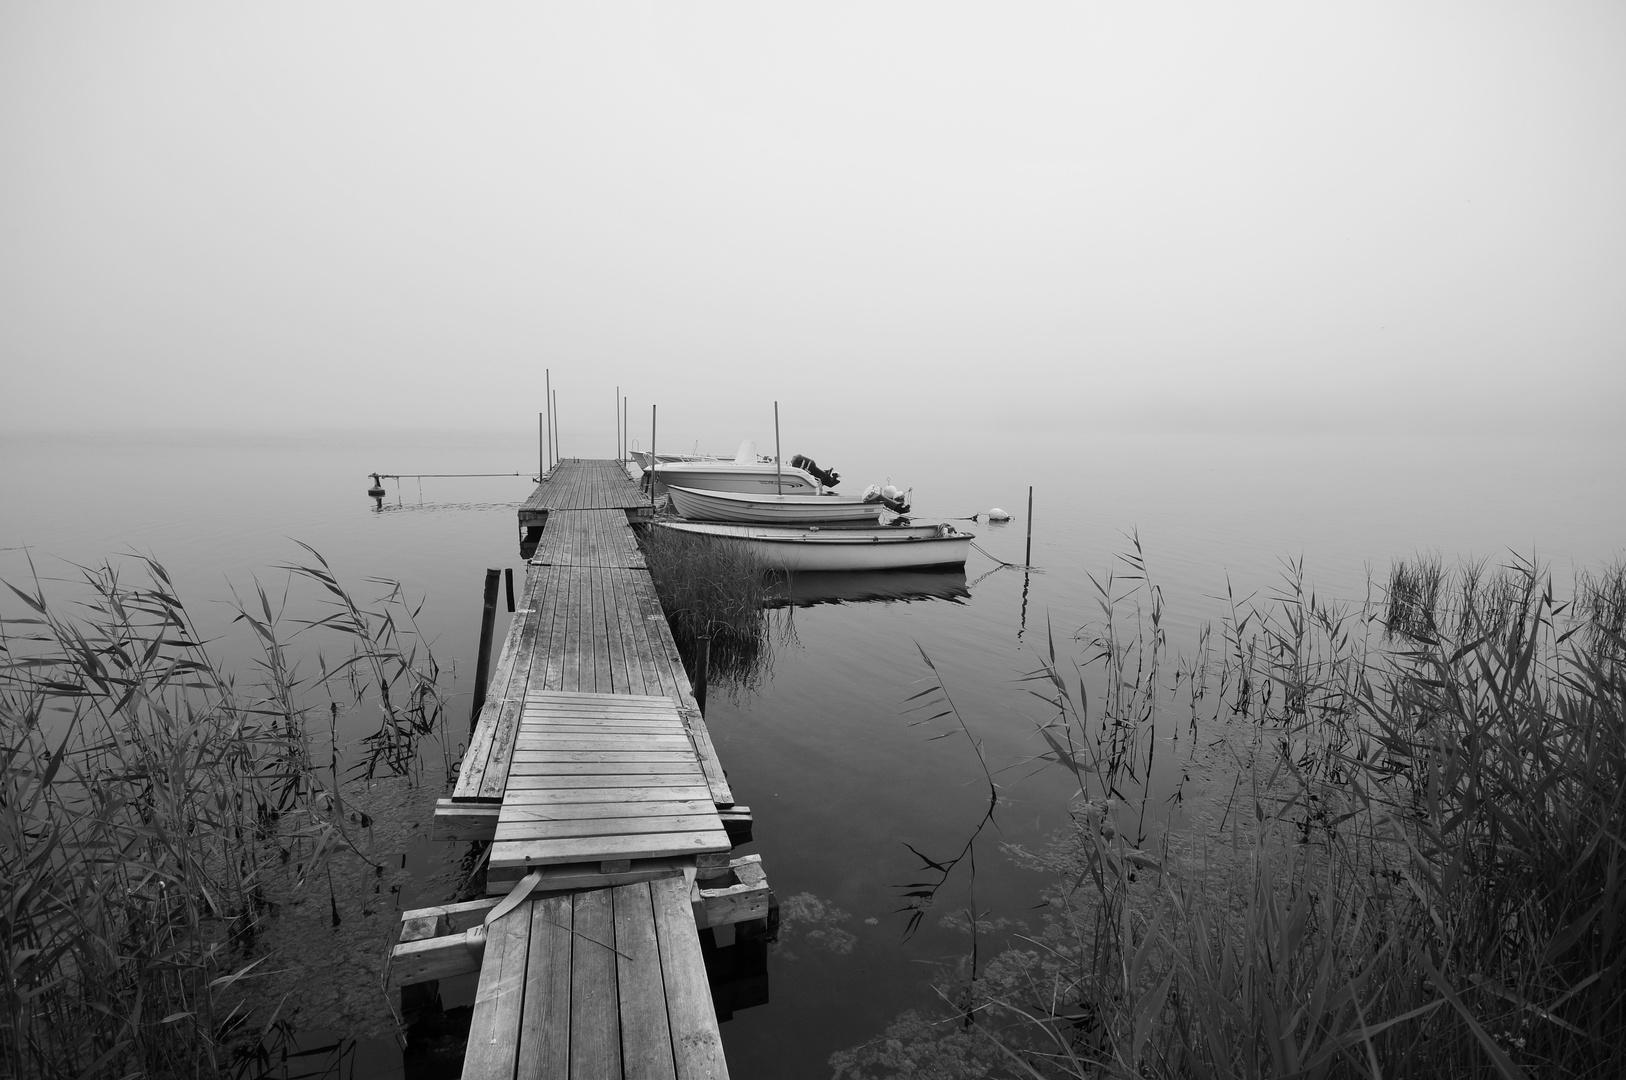 verloren im Nebel